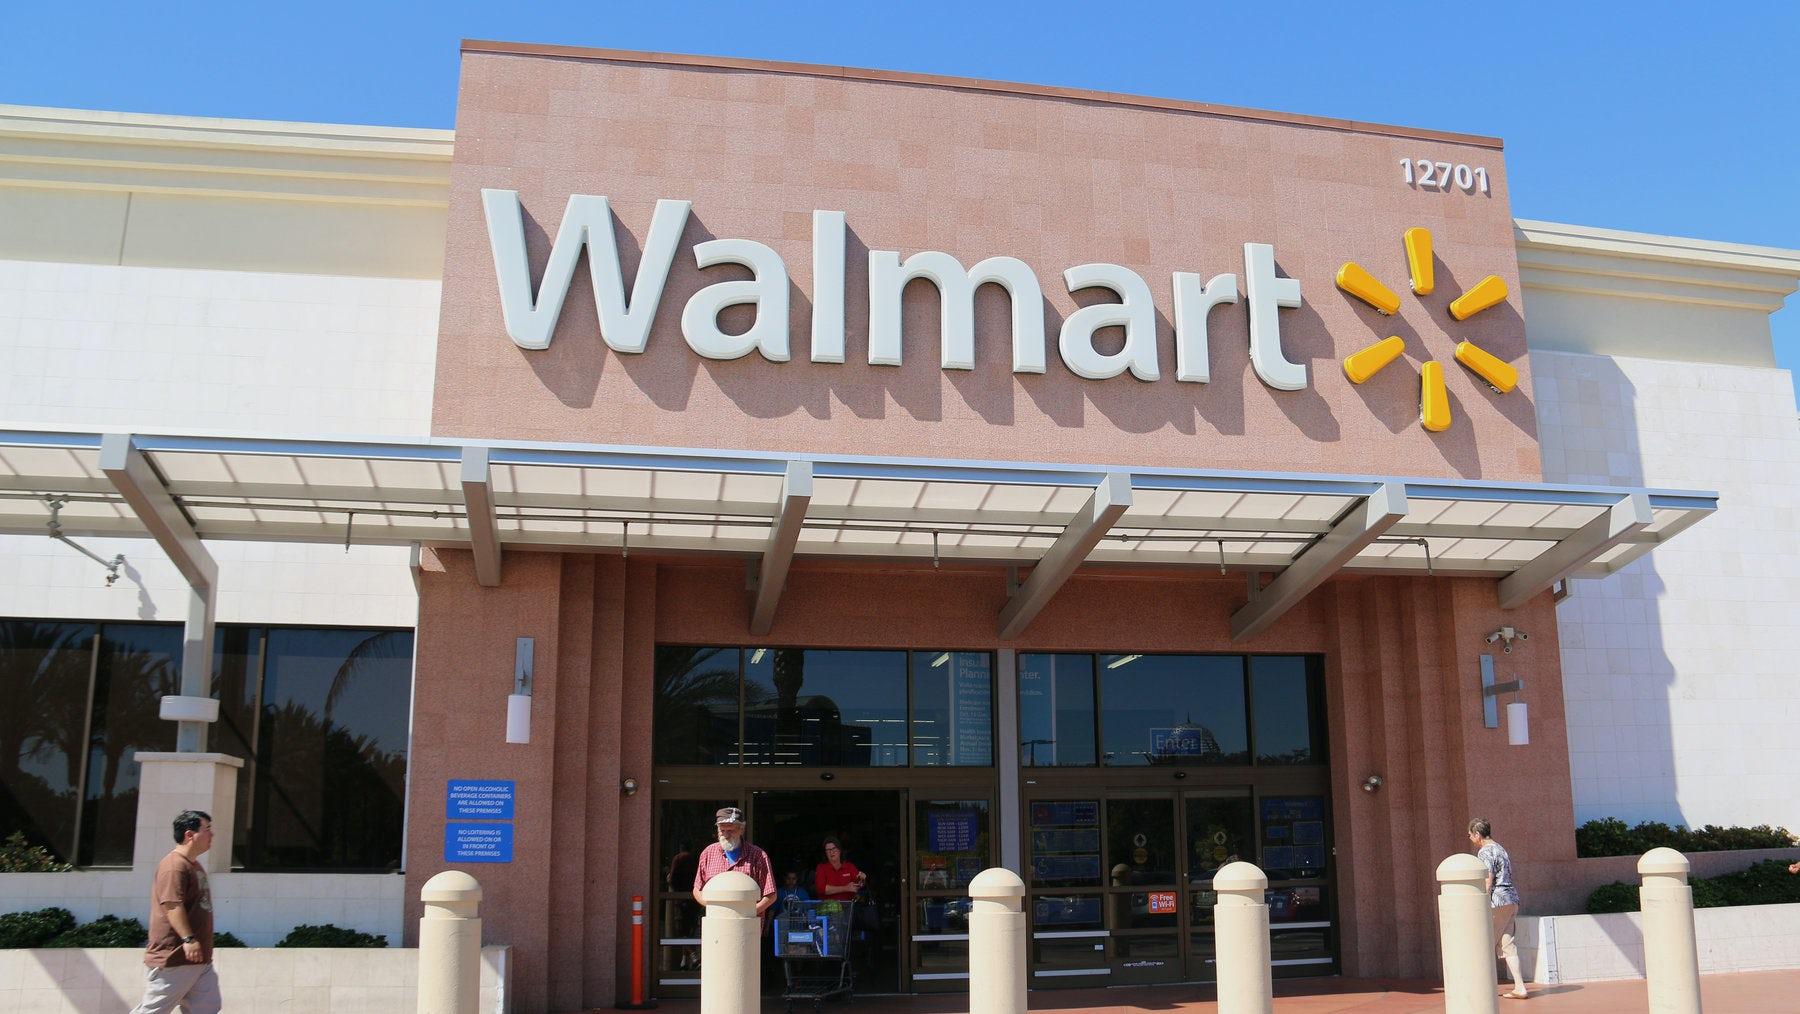 Walmart Store in California | Source: Shutterstock